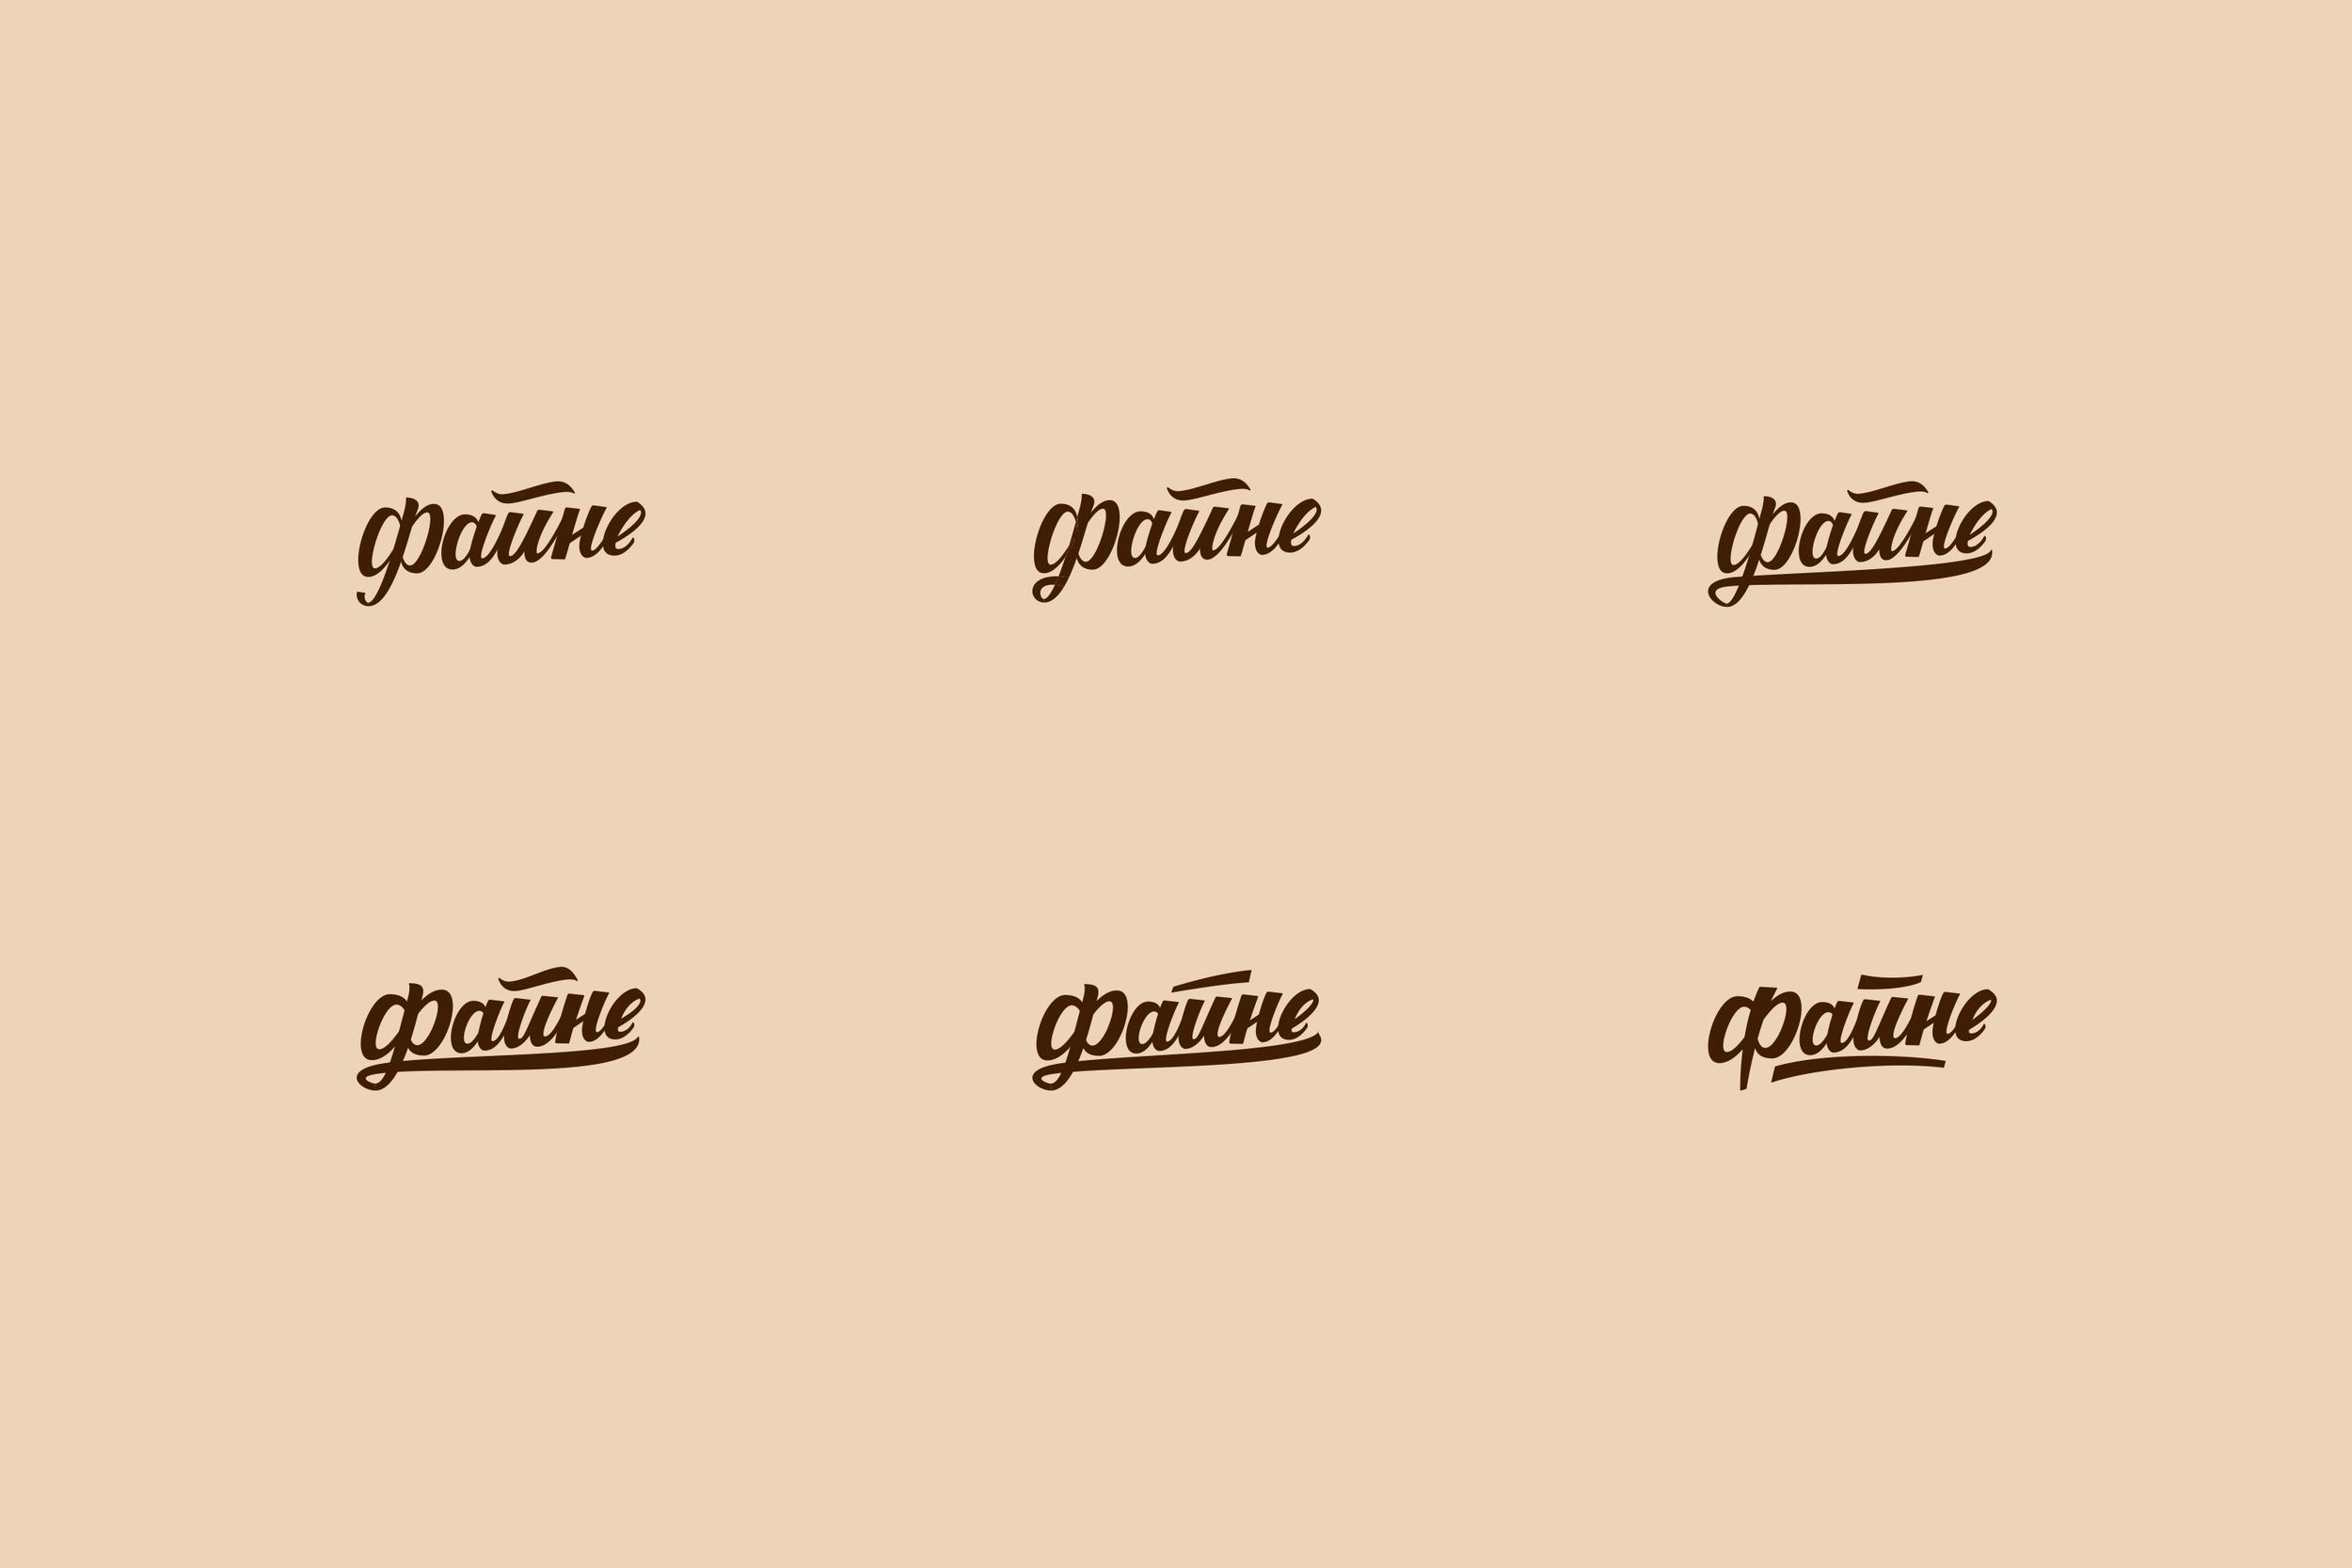 01.-fayne.png